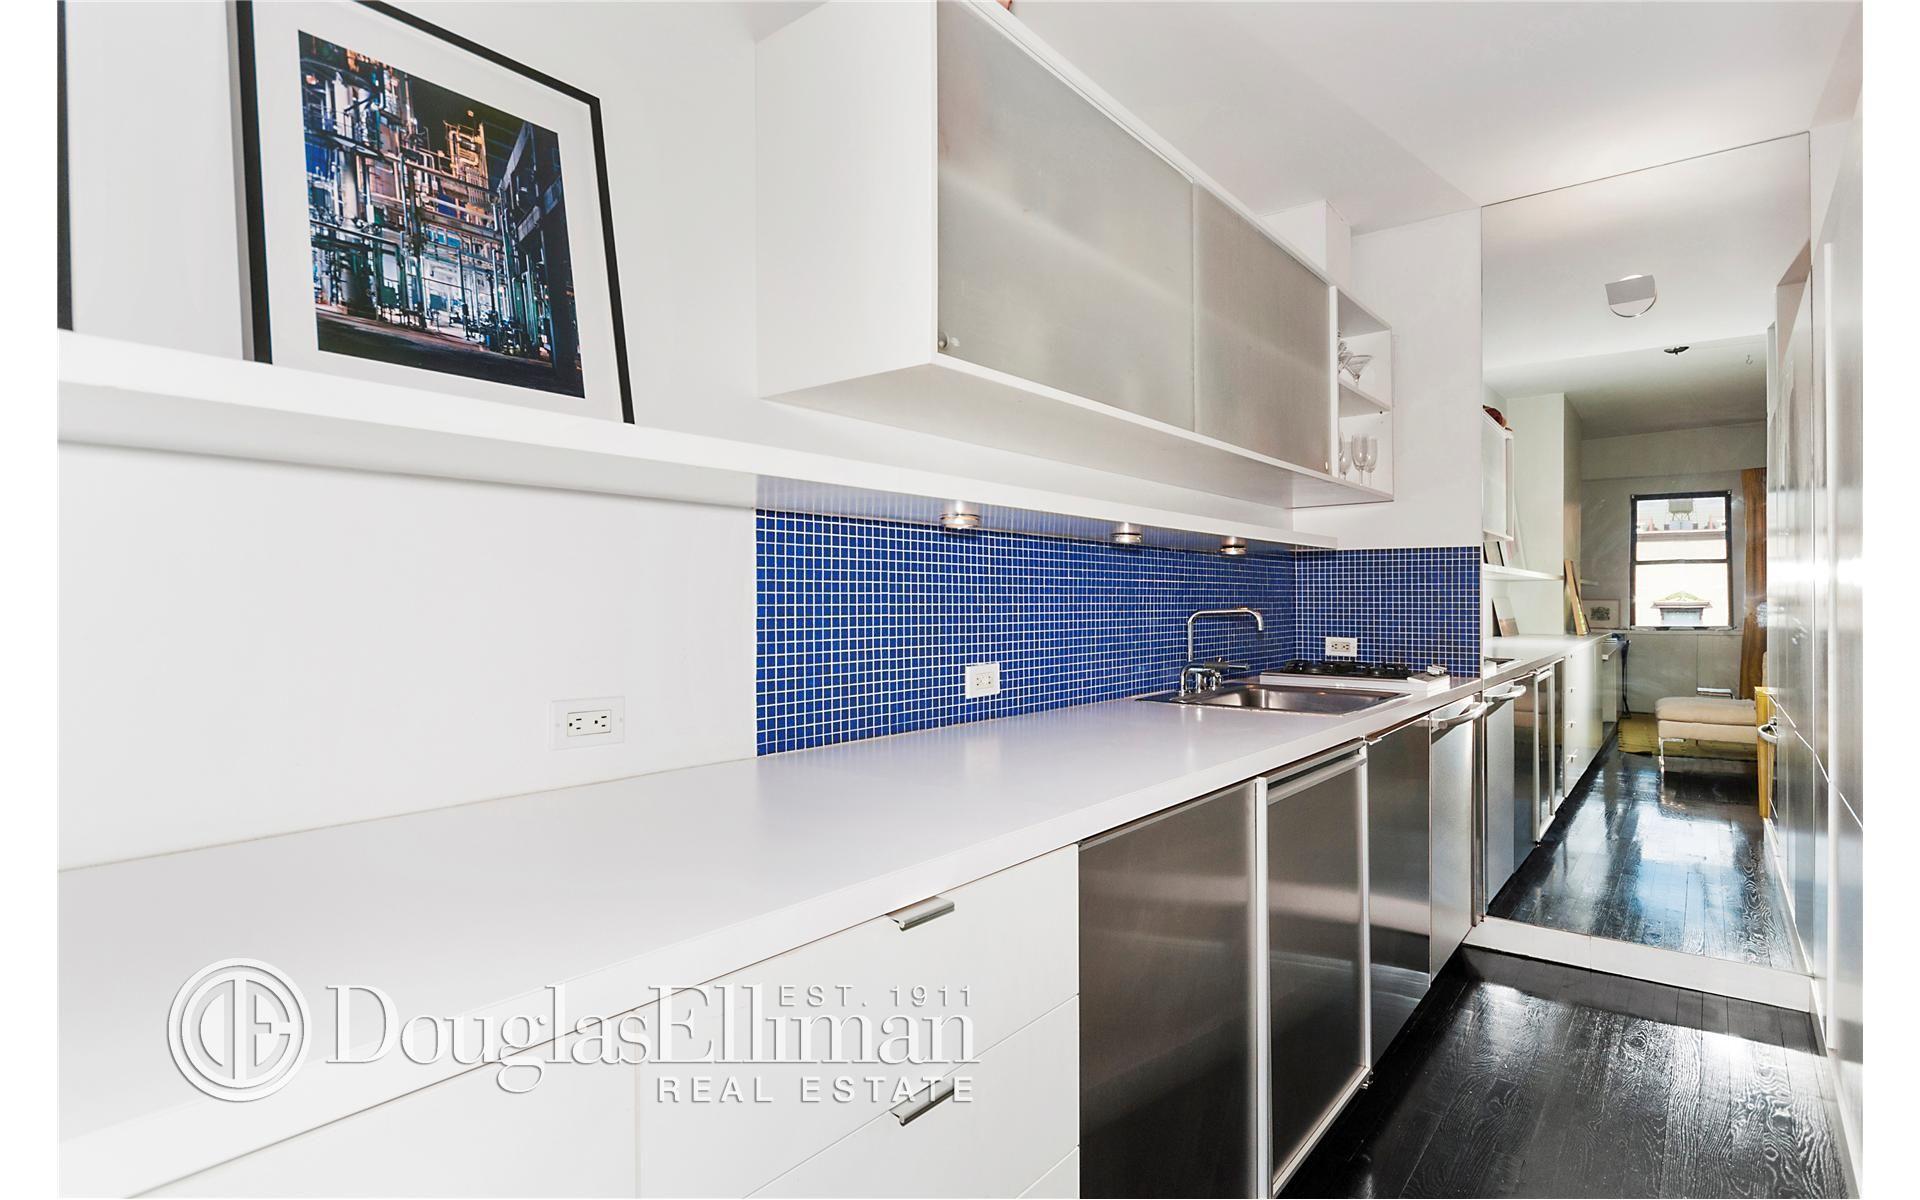 Co-op for sale in Chelsea, Manhattan for $699,000, 2.5 rooms, studio, 1 bath